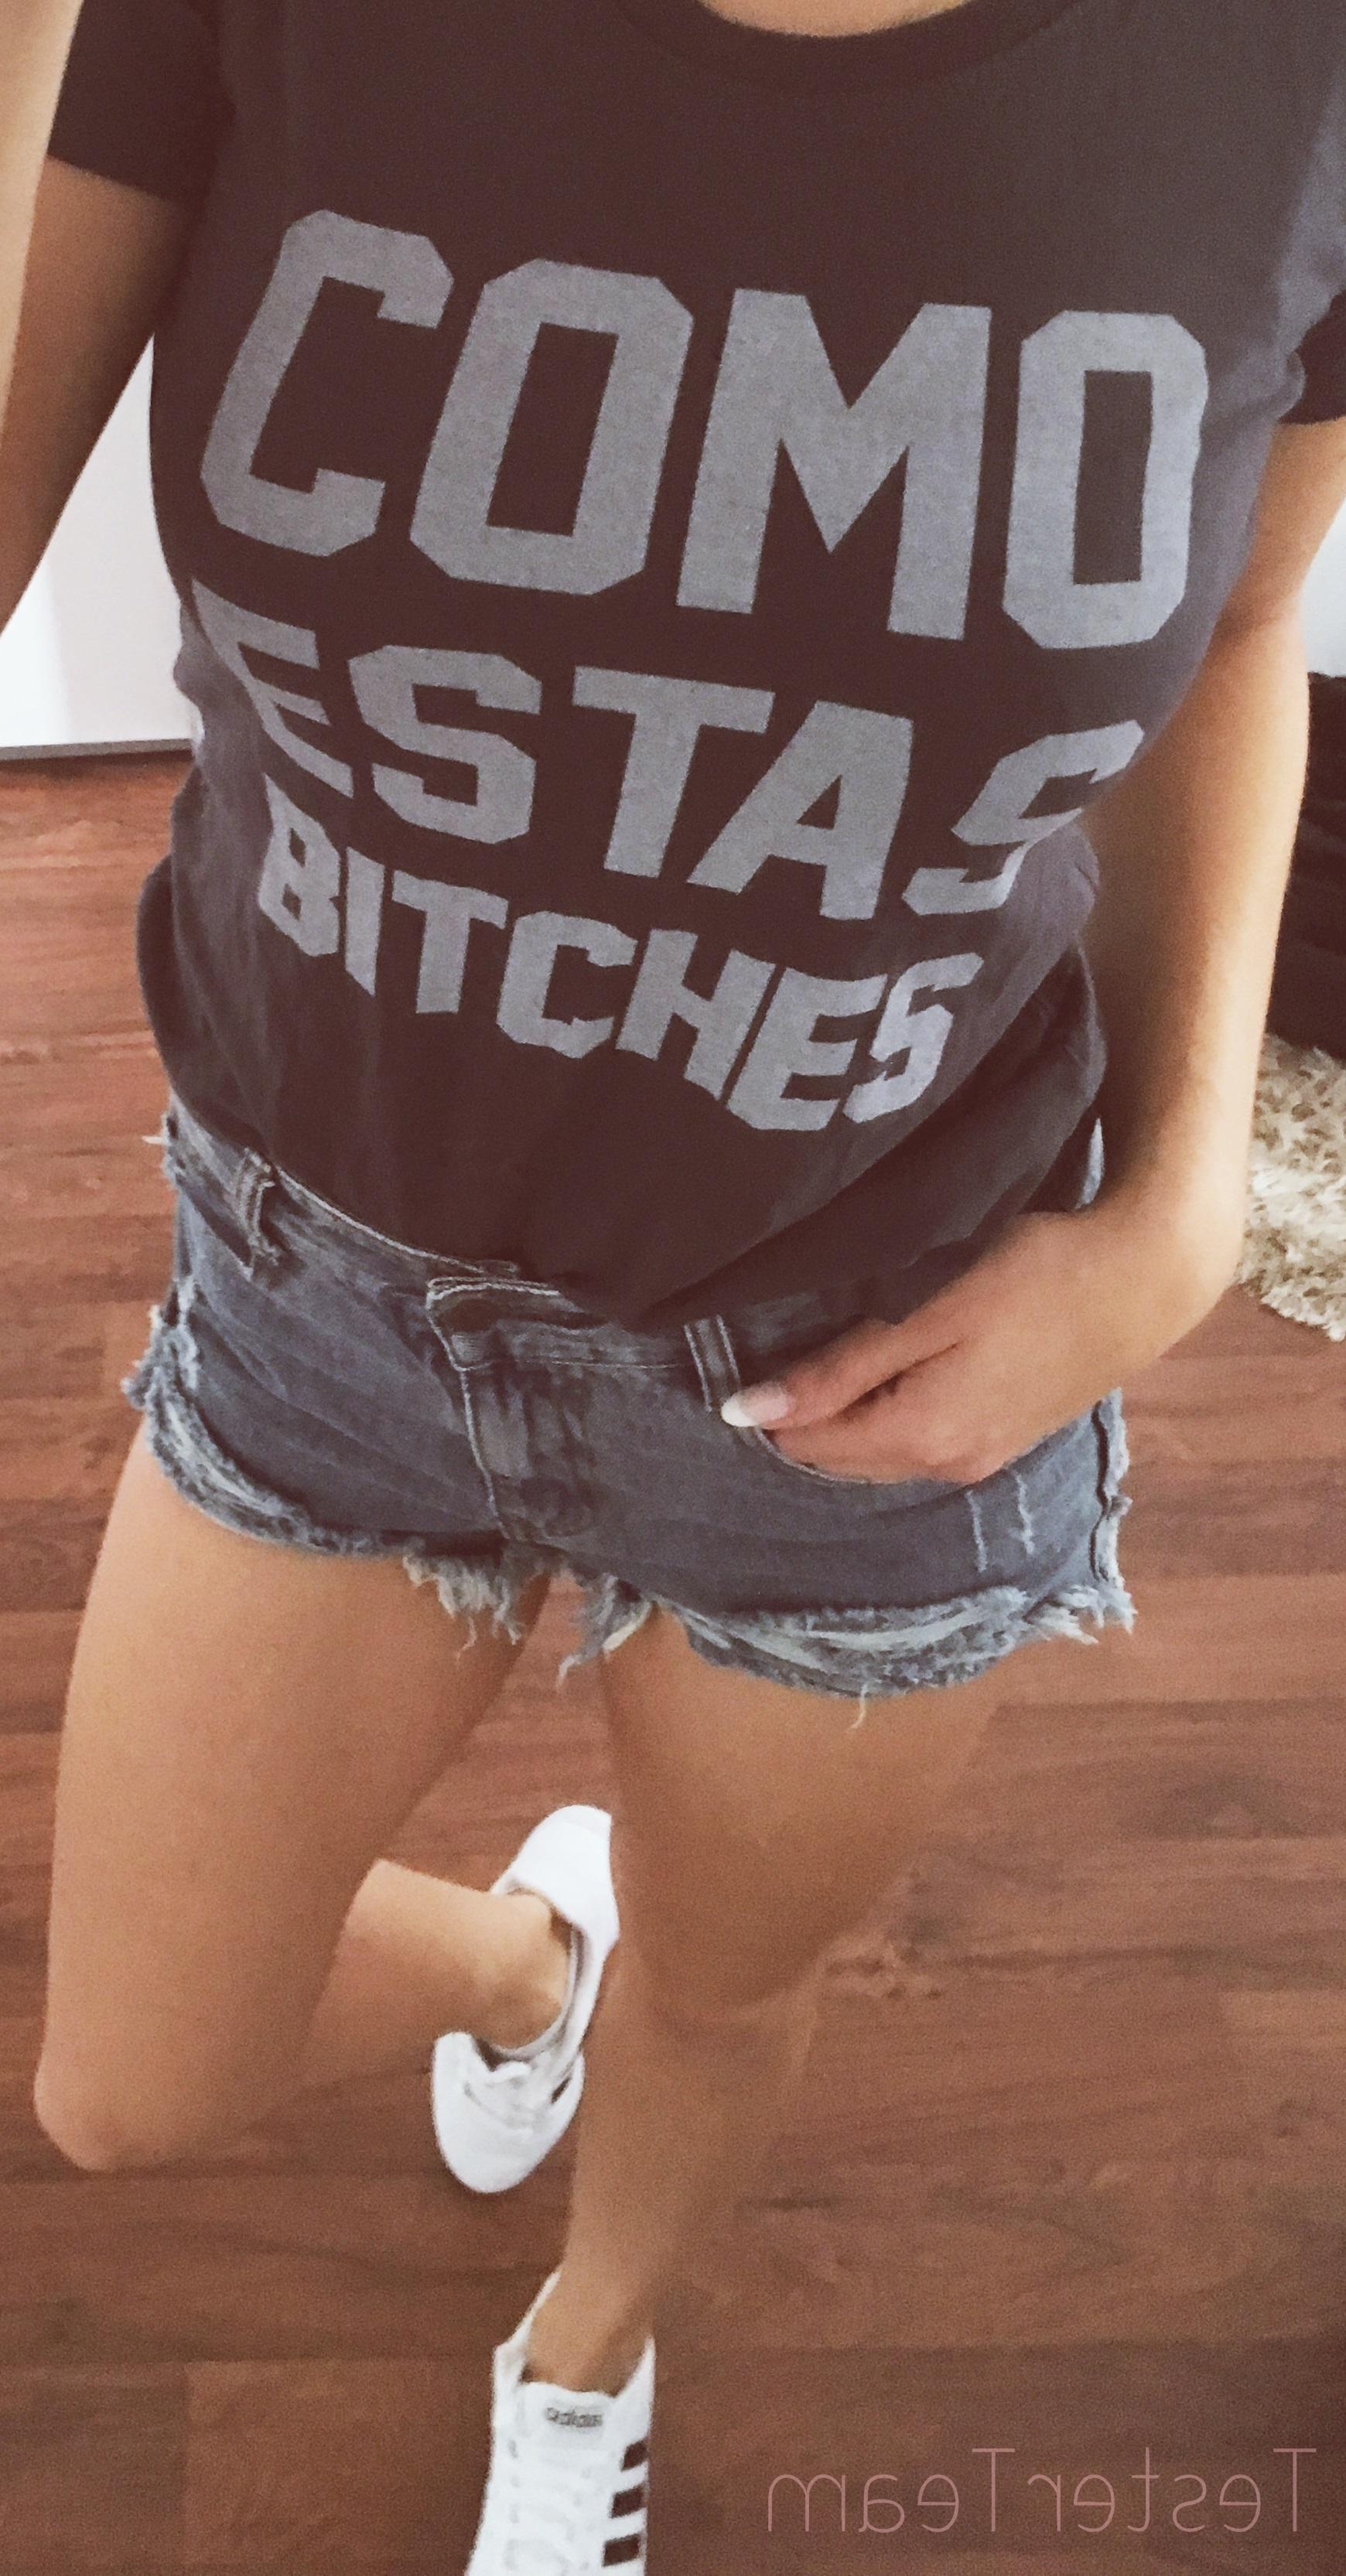 Kater likoli und das shirt Como Vestas bitches